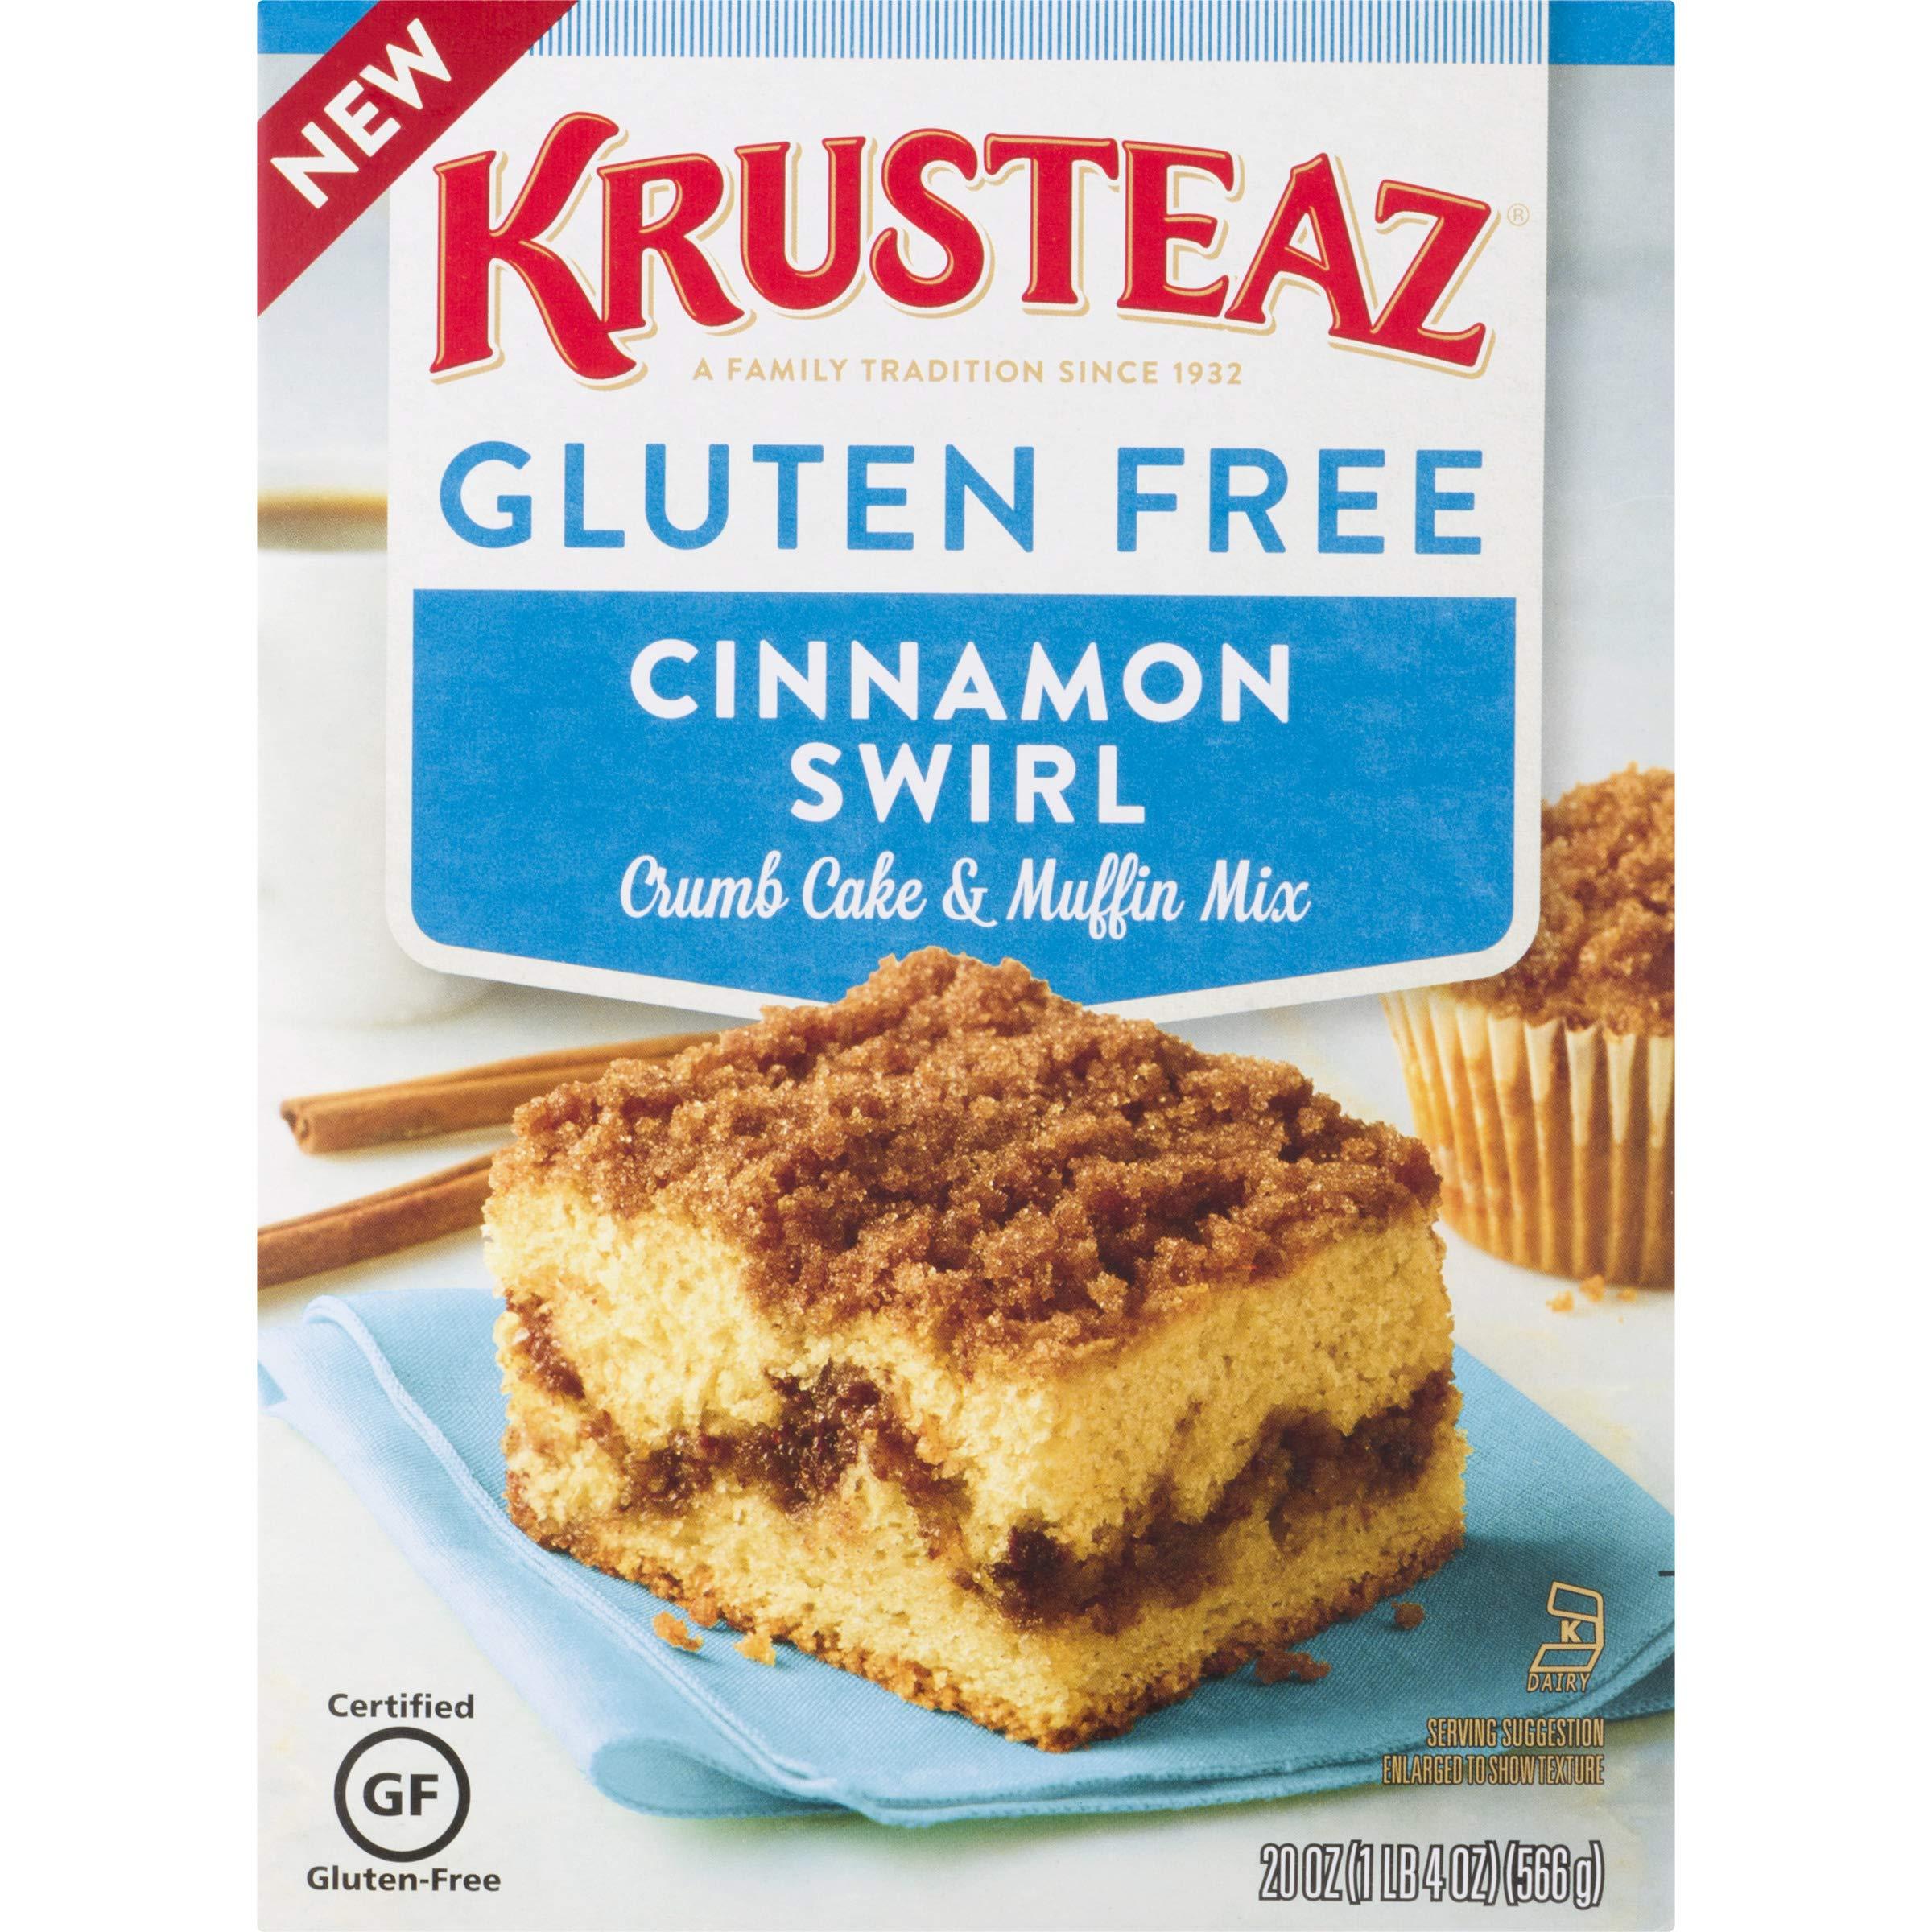 Krusteaz Gluten-Free Crumb Cake Mix, Cinnamon, 20 Ounce, Pack of 8 by Krusteaz